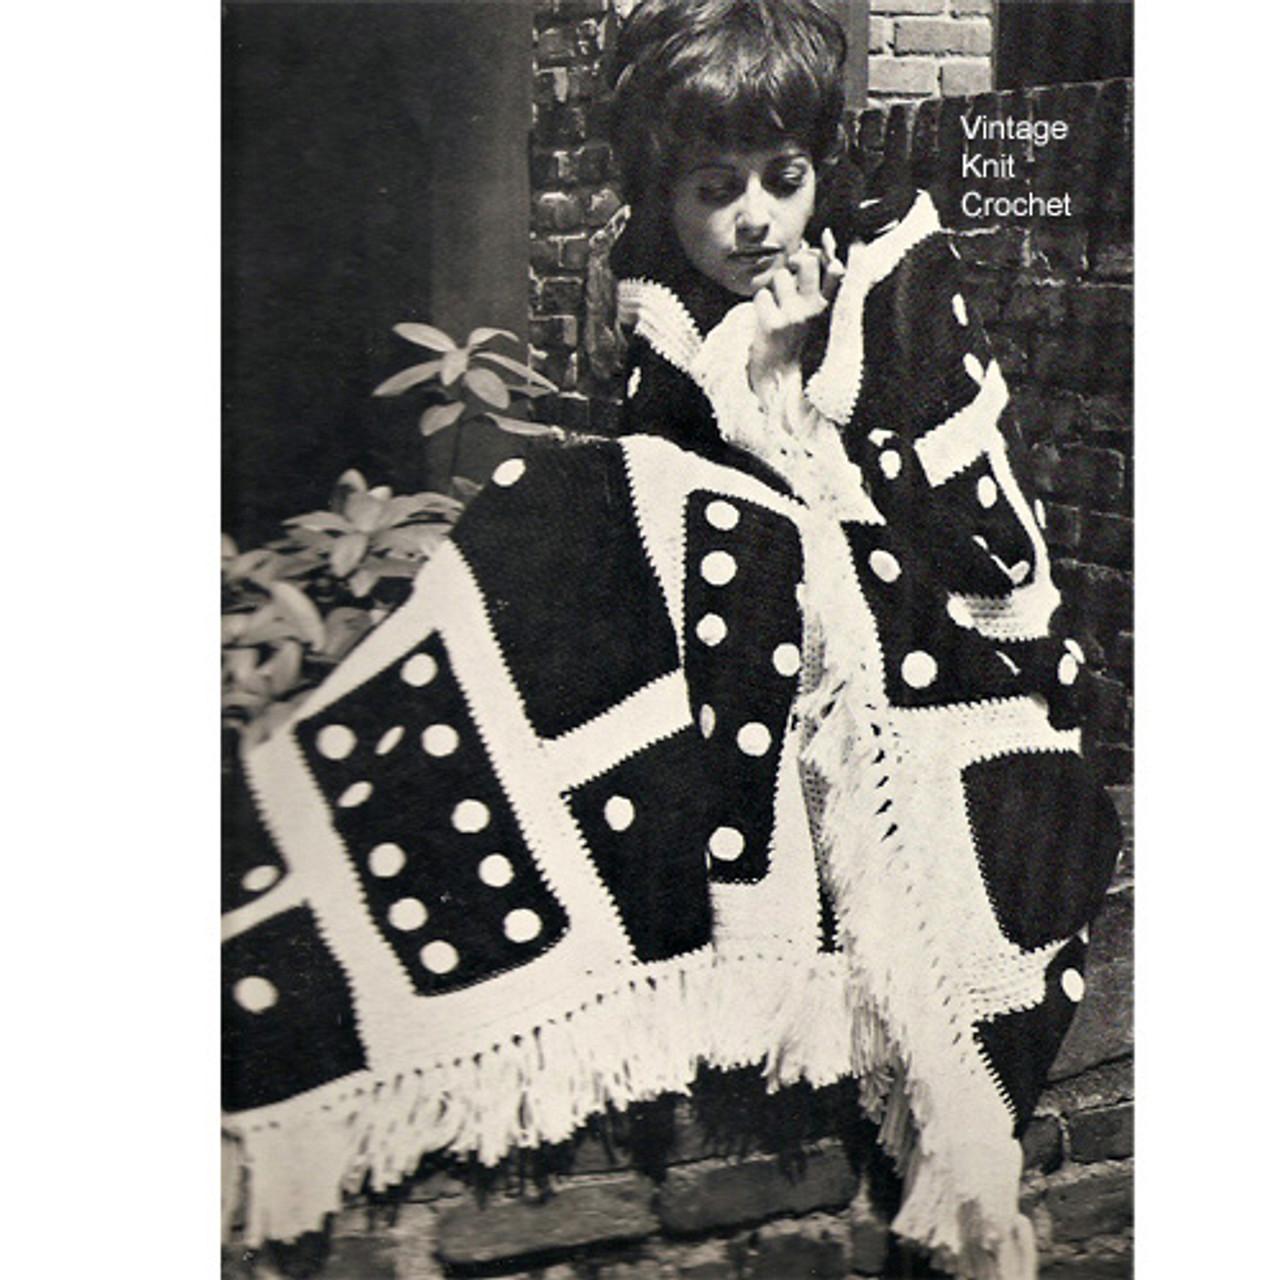 Crochet Domino motif fringed afghan pattern